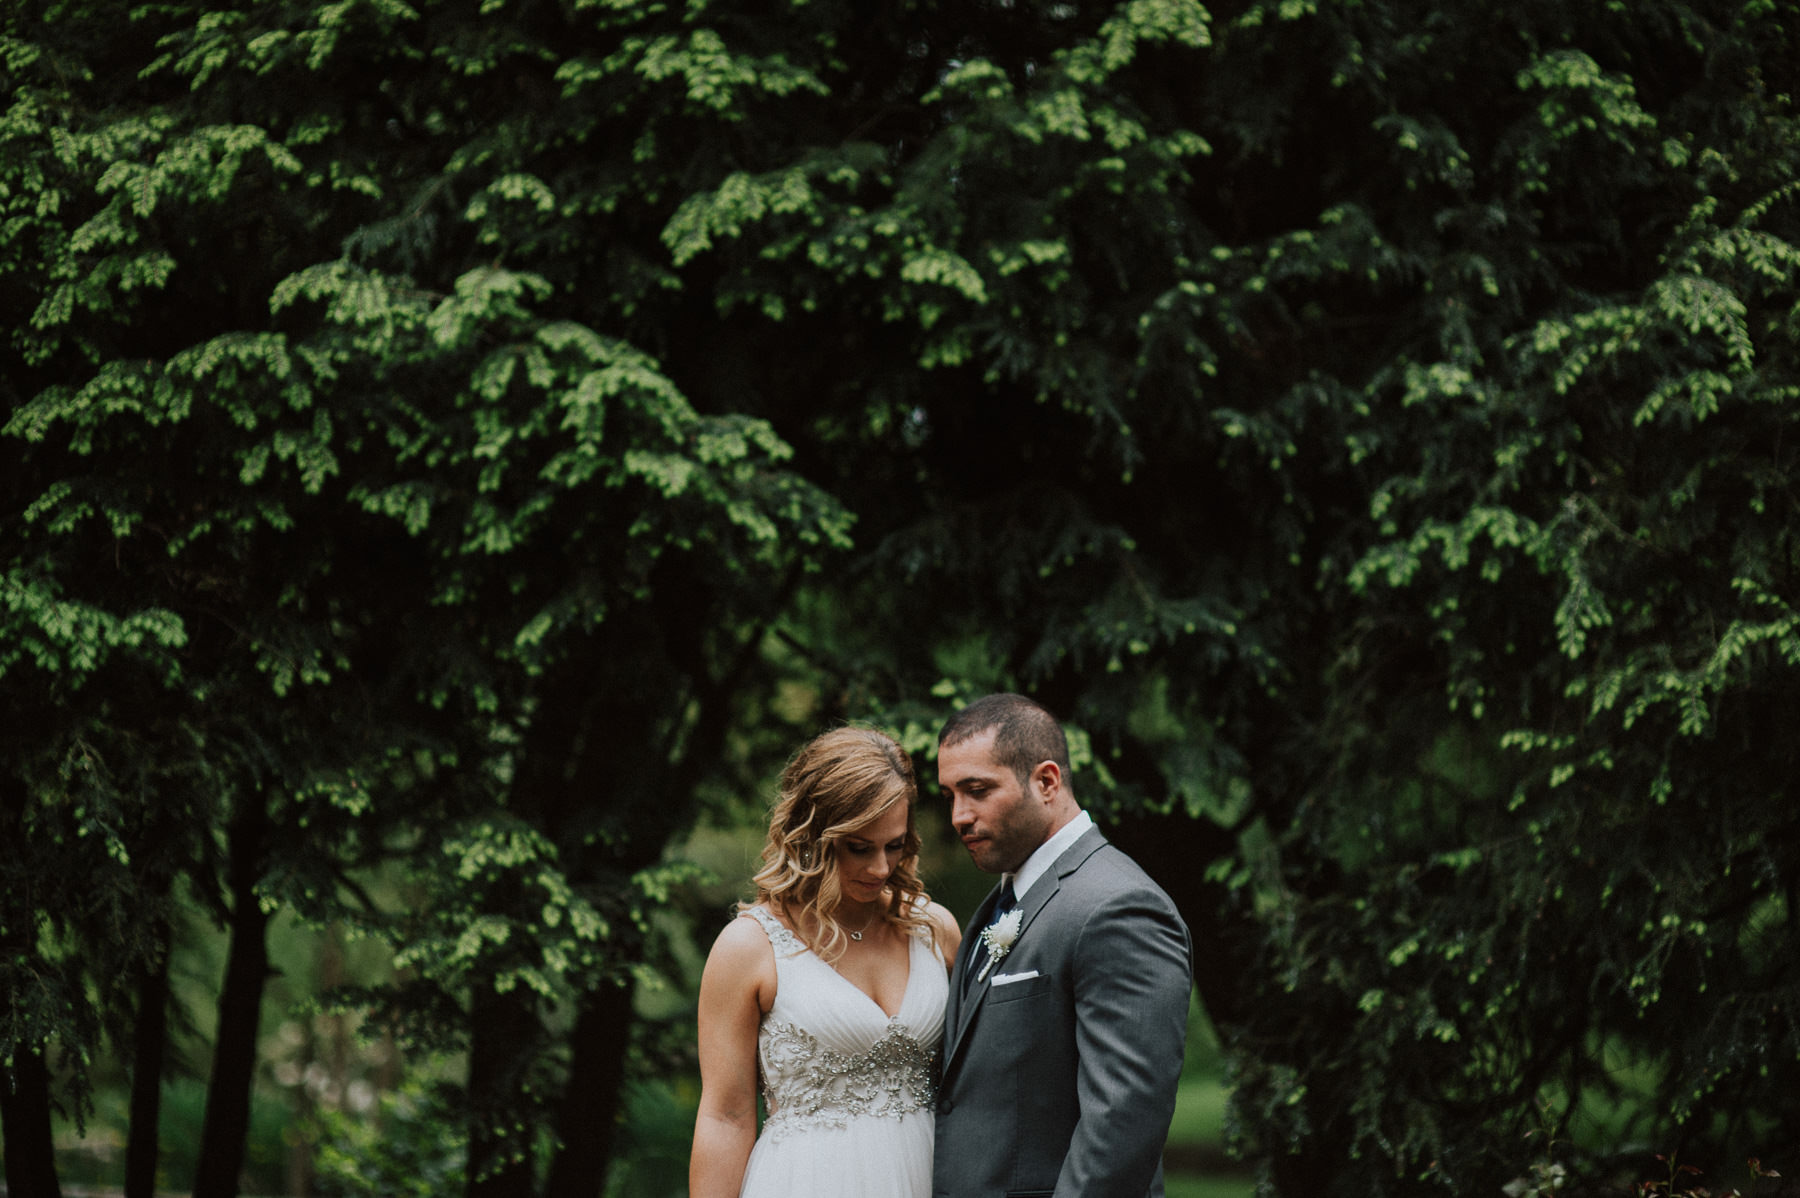 appleford-estate-wedding-photography-34.jpg